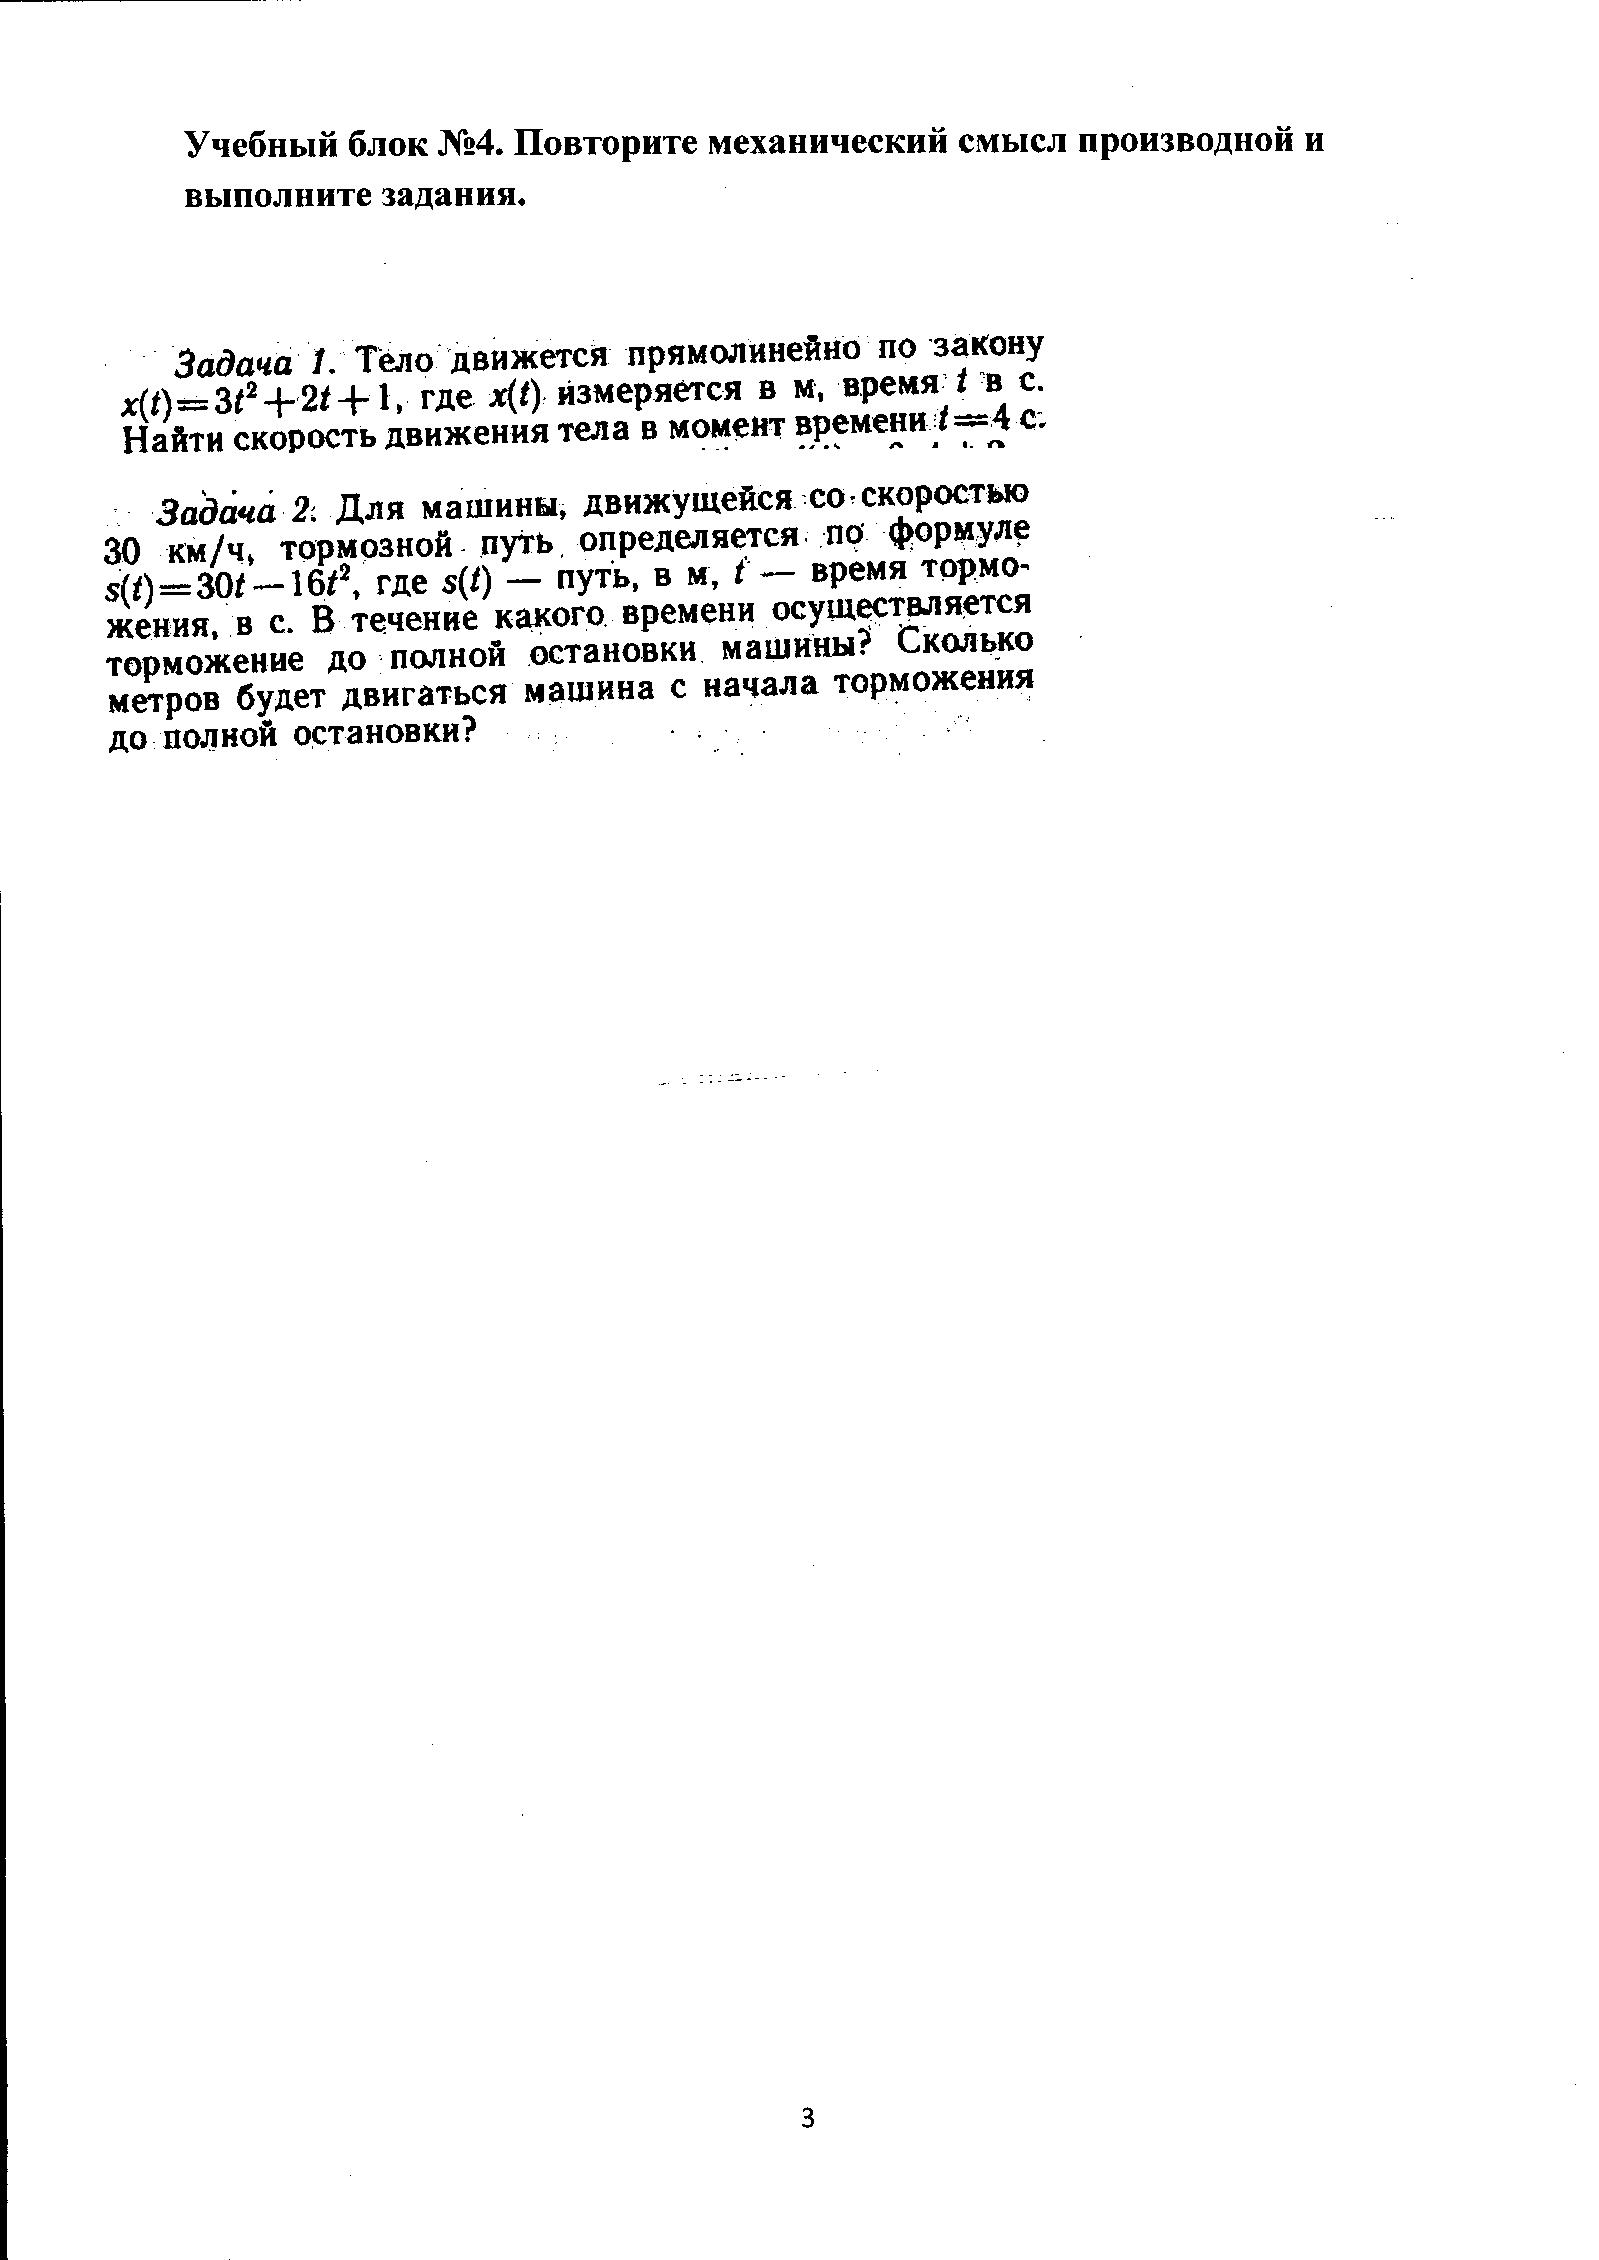 C:\Documents and Settings\Юлия\Мои документы\Мои рисунки\MP Navigator EX\2012_02_20\IMG_0003.tif